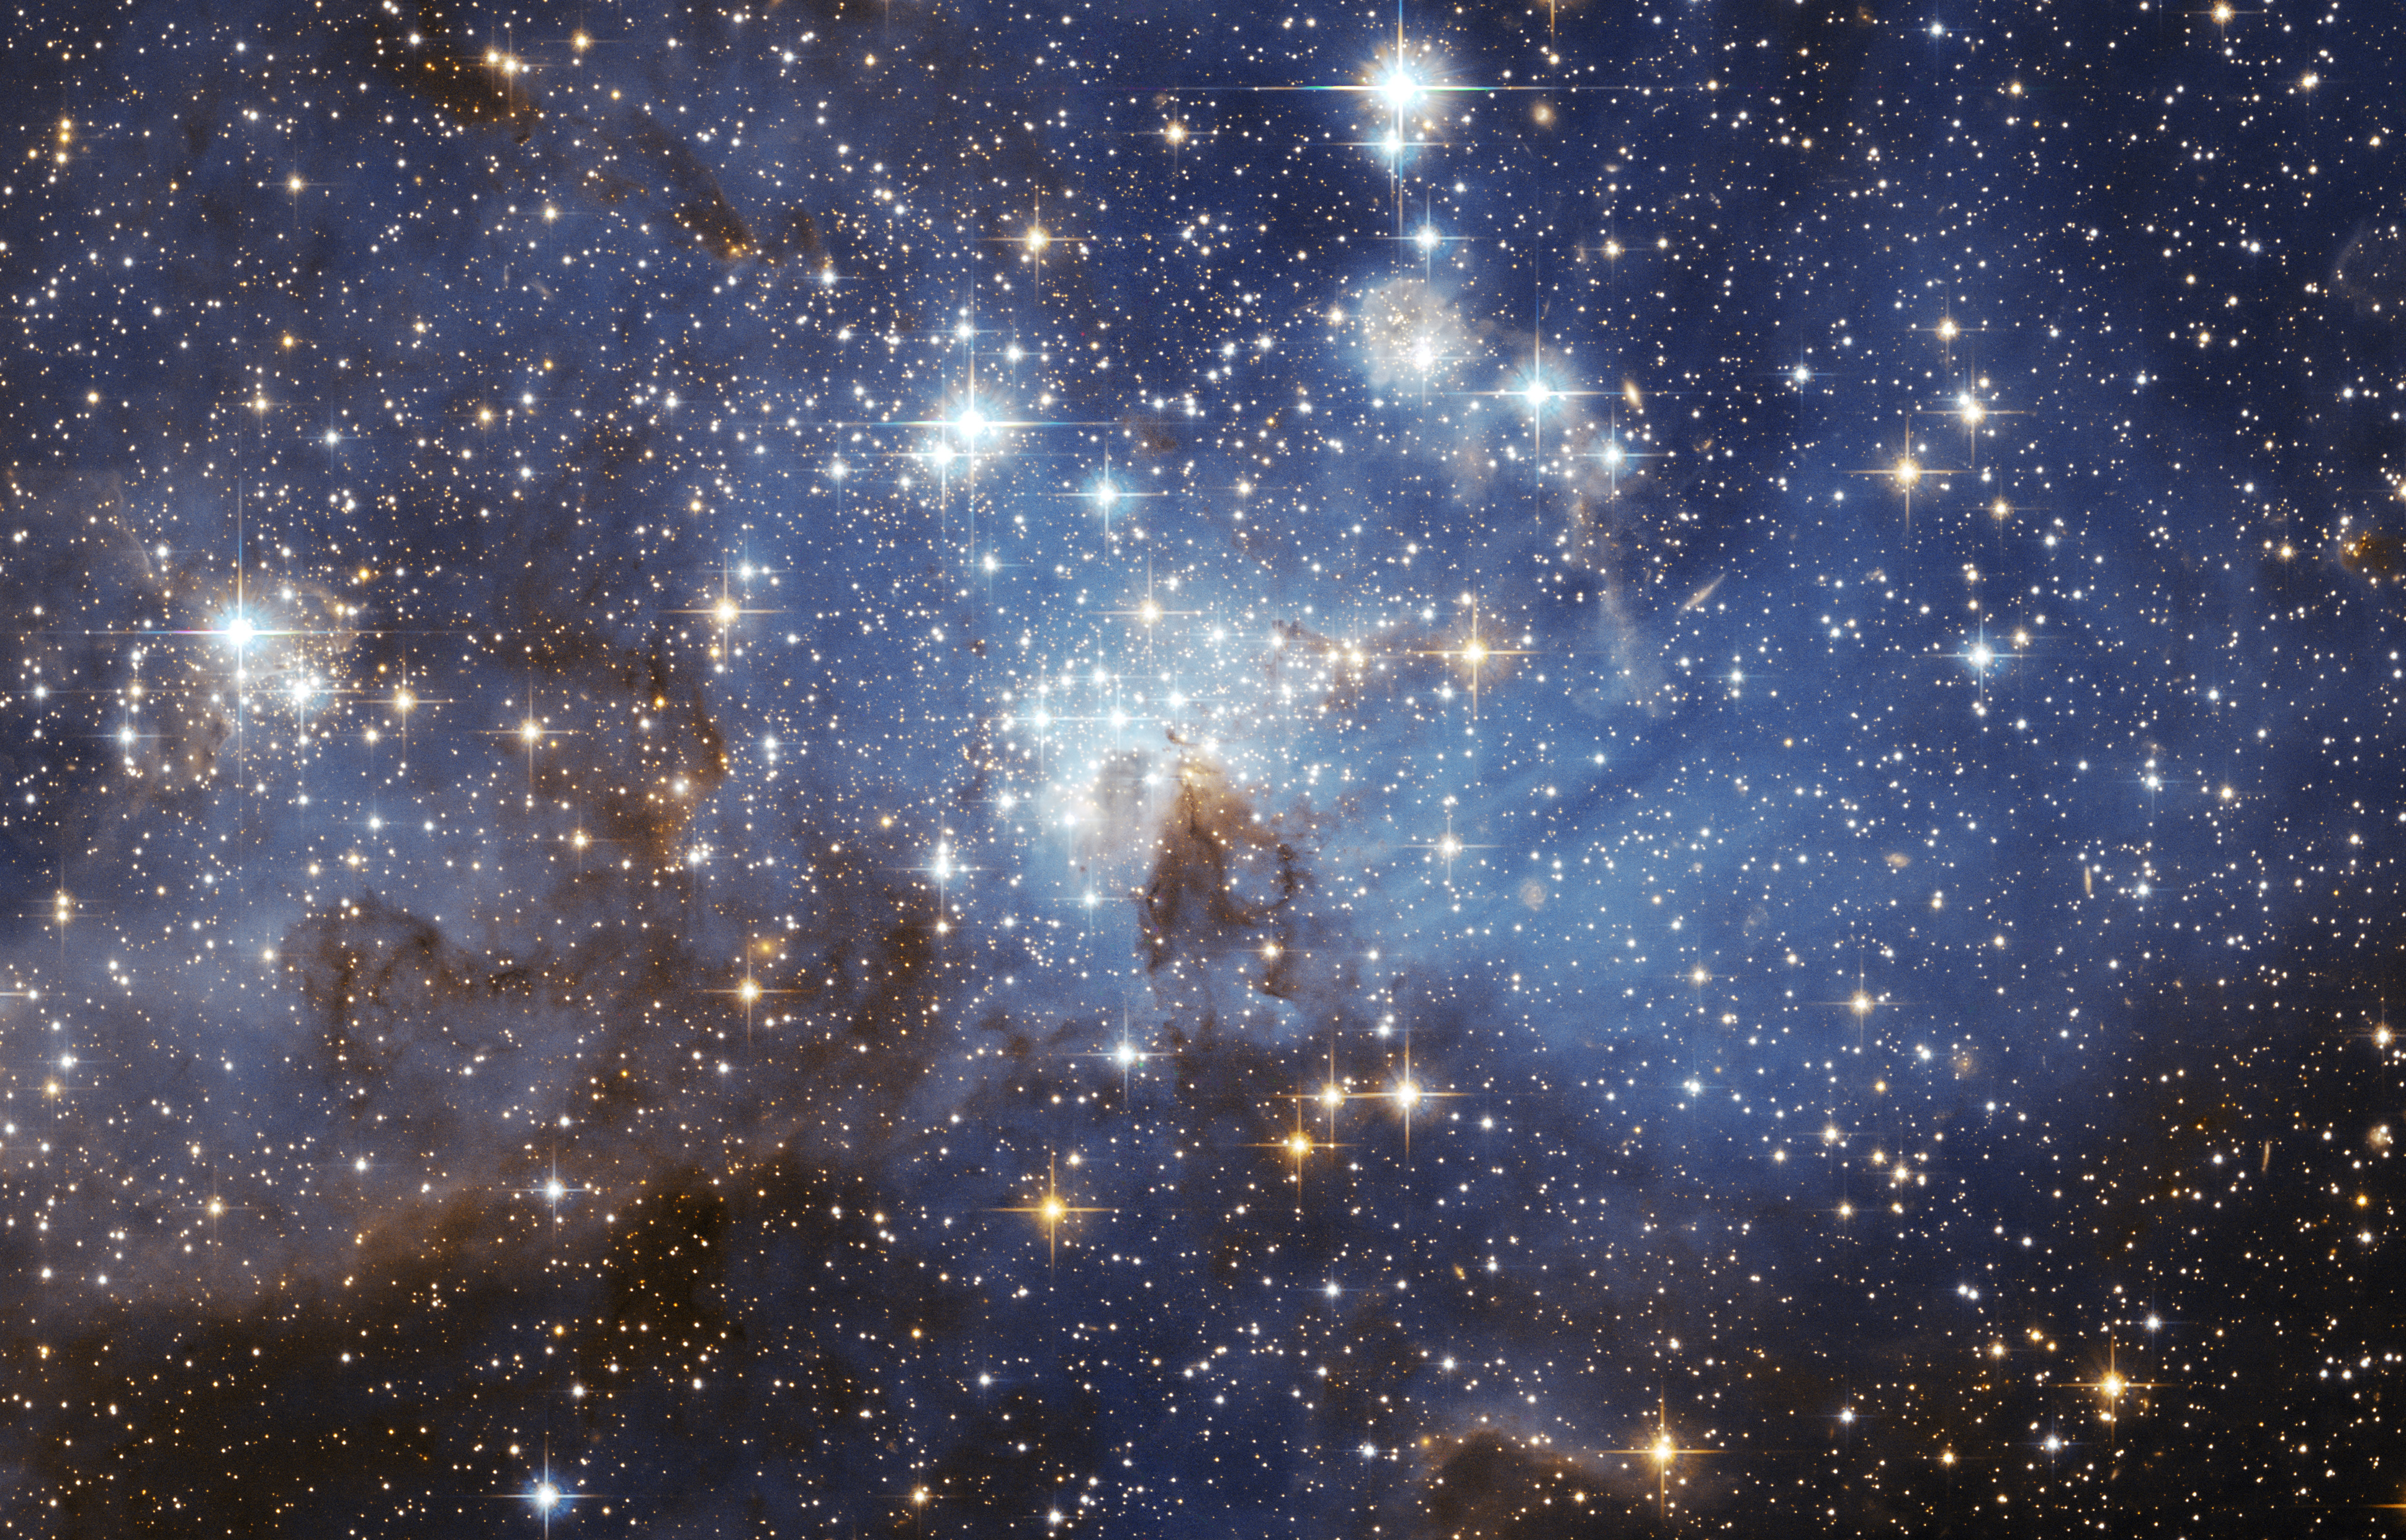 3 163 LH-95 LMC Hubble